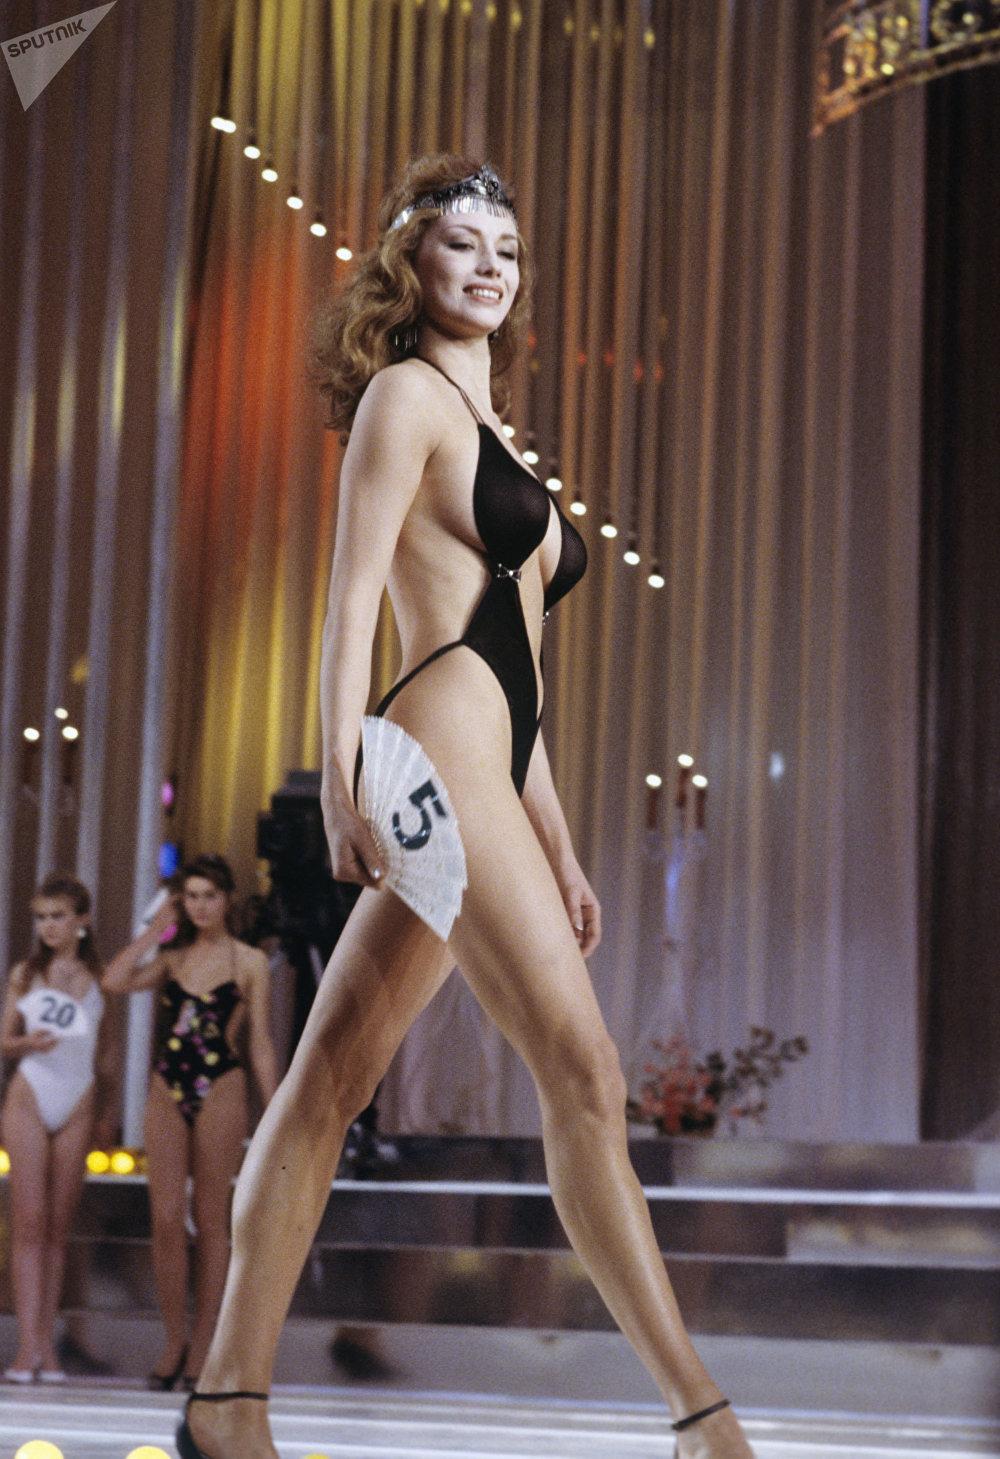 La ganadora del tercer lugar del Primer Concurso de Belleza Miss URSS 89, Ekaterina Mescheriakova, de la región de Perm.